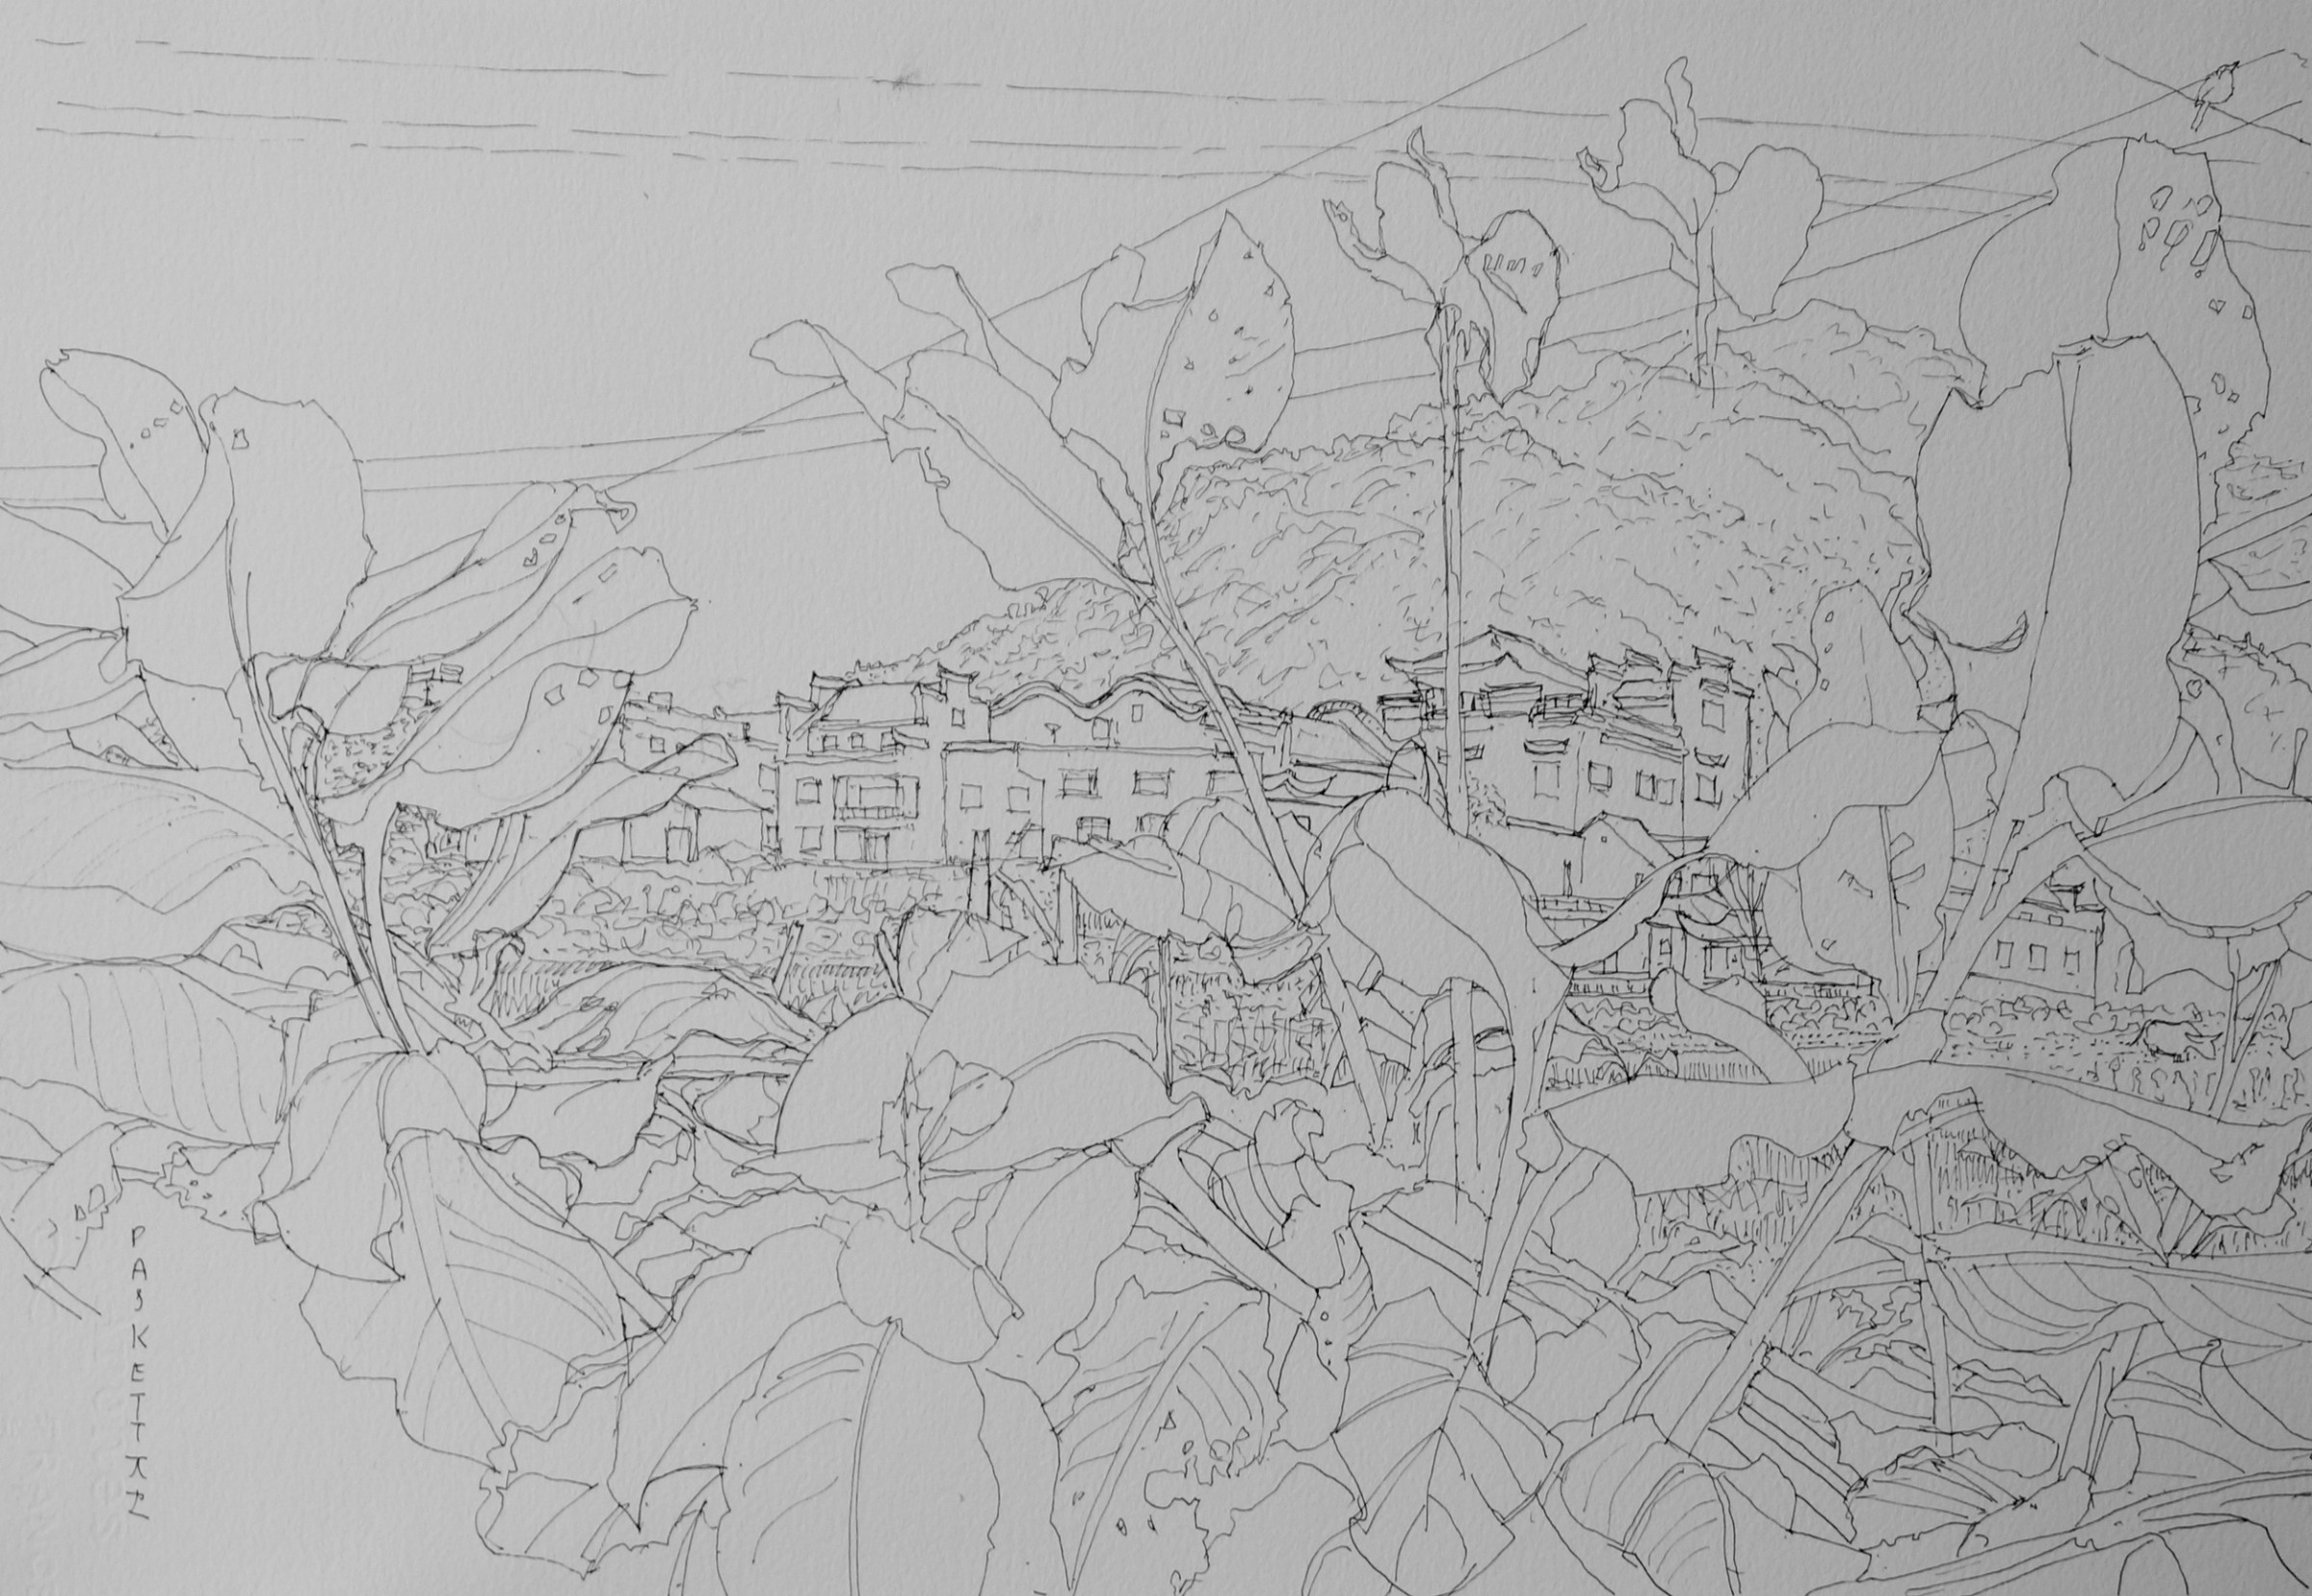 <span class=&#34;link fancybox-details-link&#34;><a href=&#34;/exhibitions/24/works/artworks_standalone10765/&#34;>View Detail Page</a></span><div class=&#34;artist&#34;><span class=&#34;artist&#34;><strong>David Paskett</strong></span></div><div class=&#34;title&#34;><em>Outside the village, Anhui</em></div><div class=&#34;medium&#34;>pen</div>